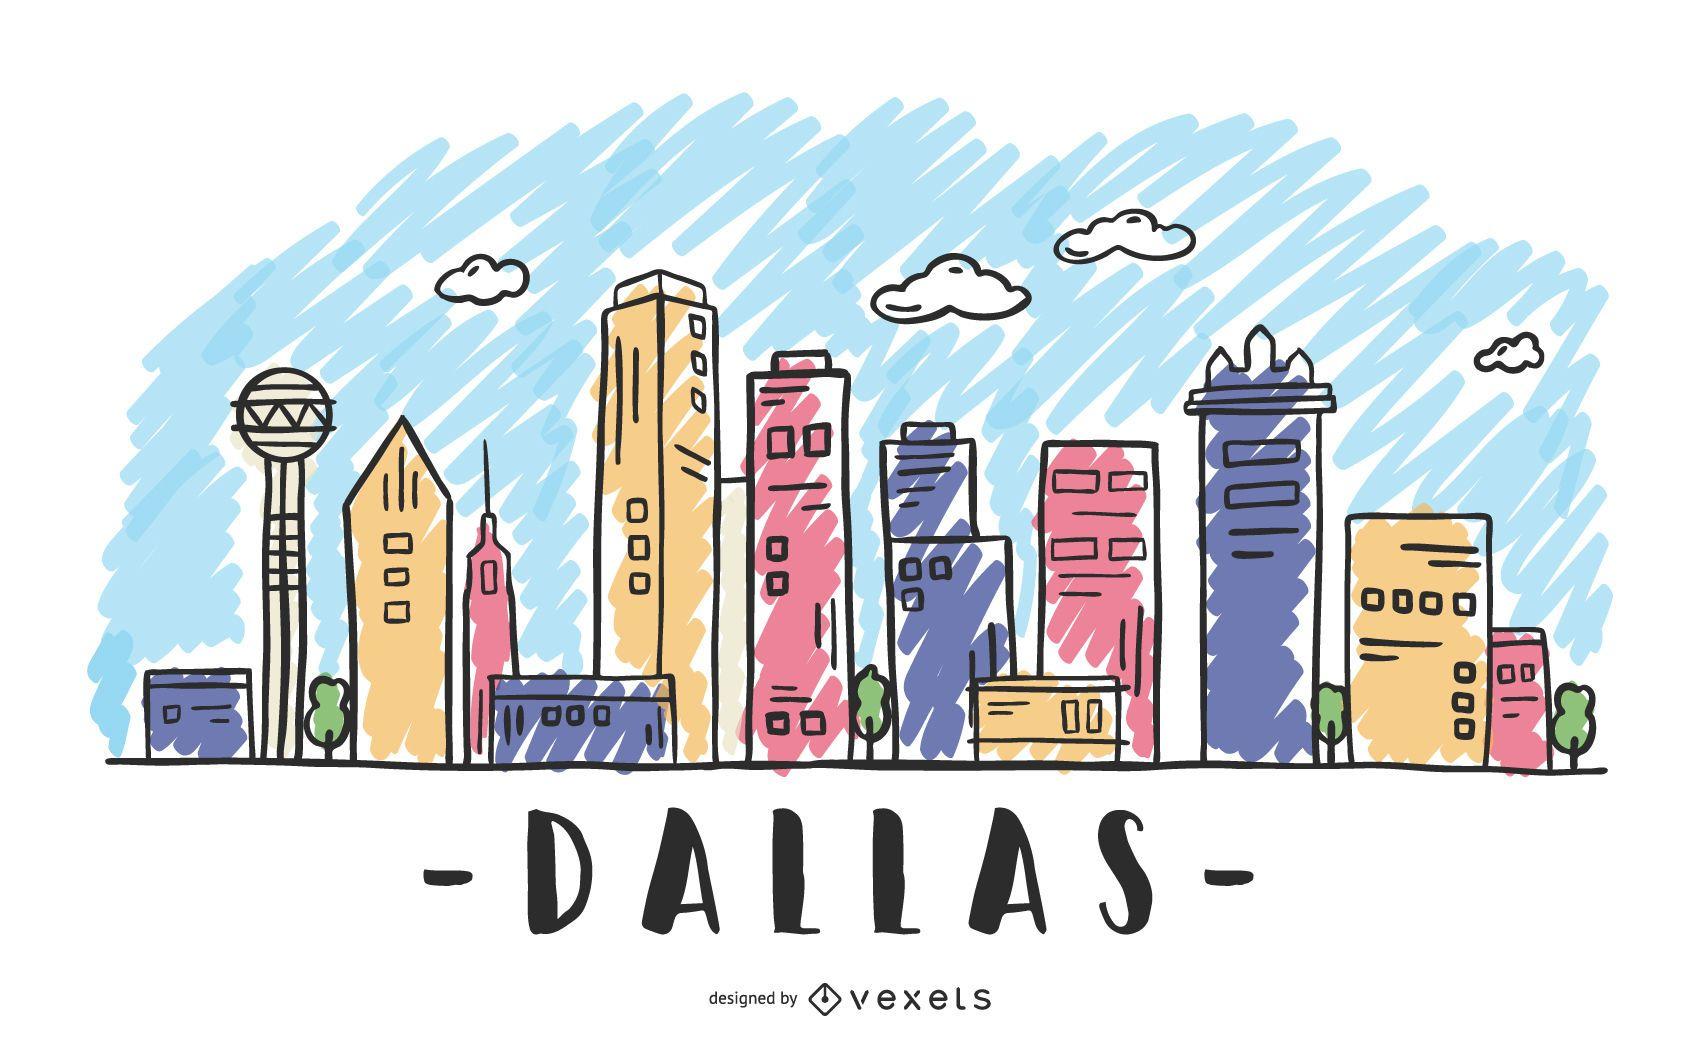 Dise?o del horizonte de Dallas Texas